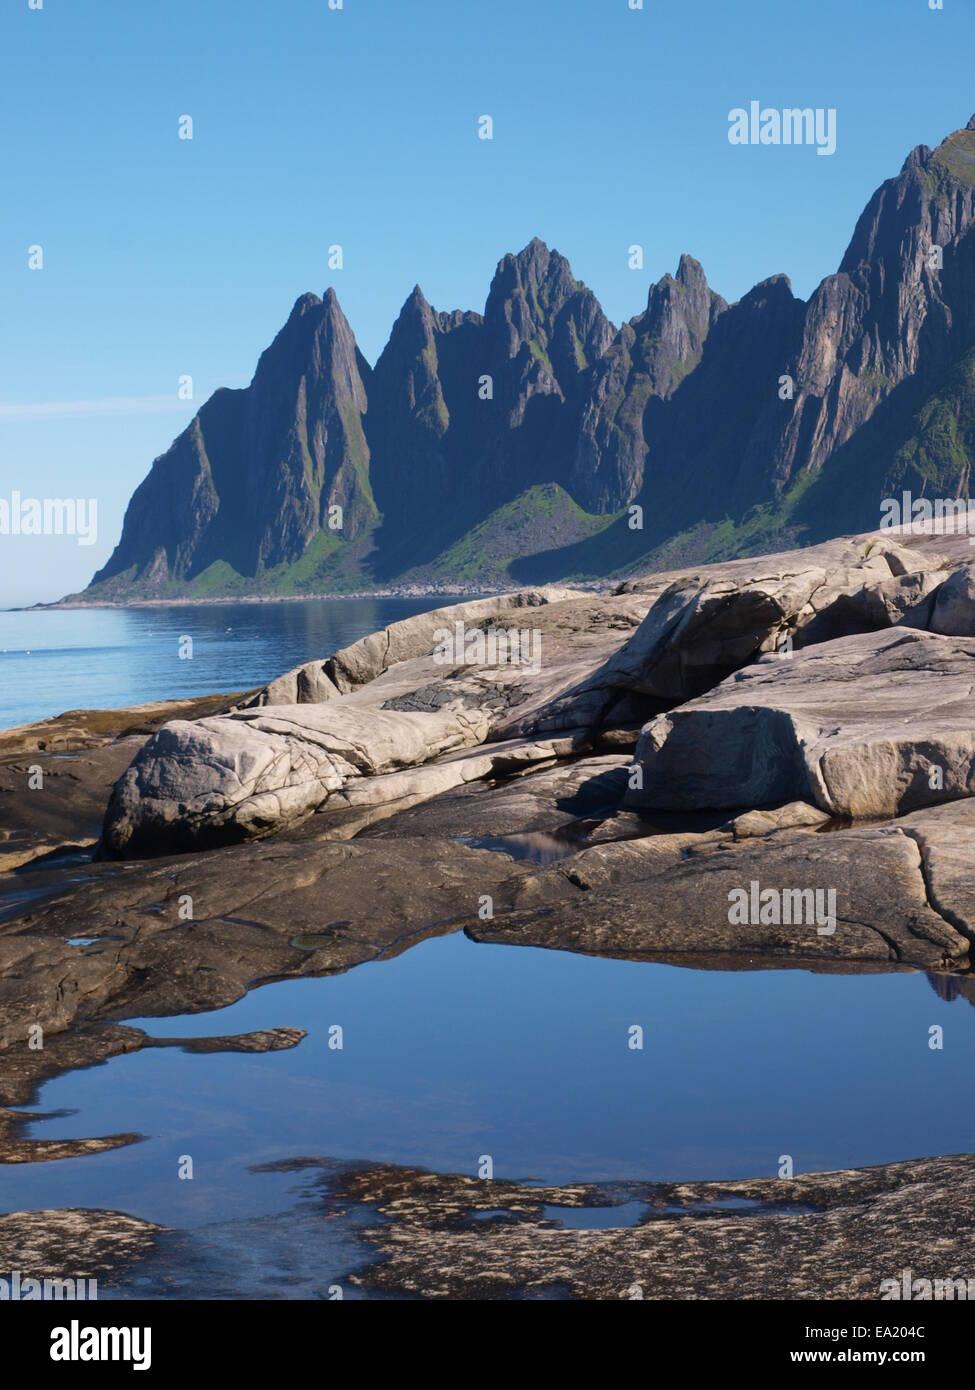 Erstfjord, Senja Island, Norway - Stock Image